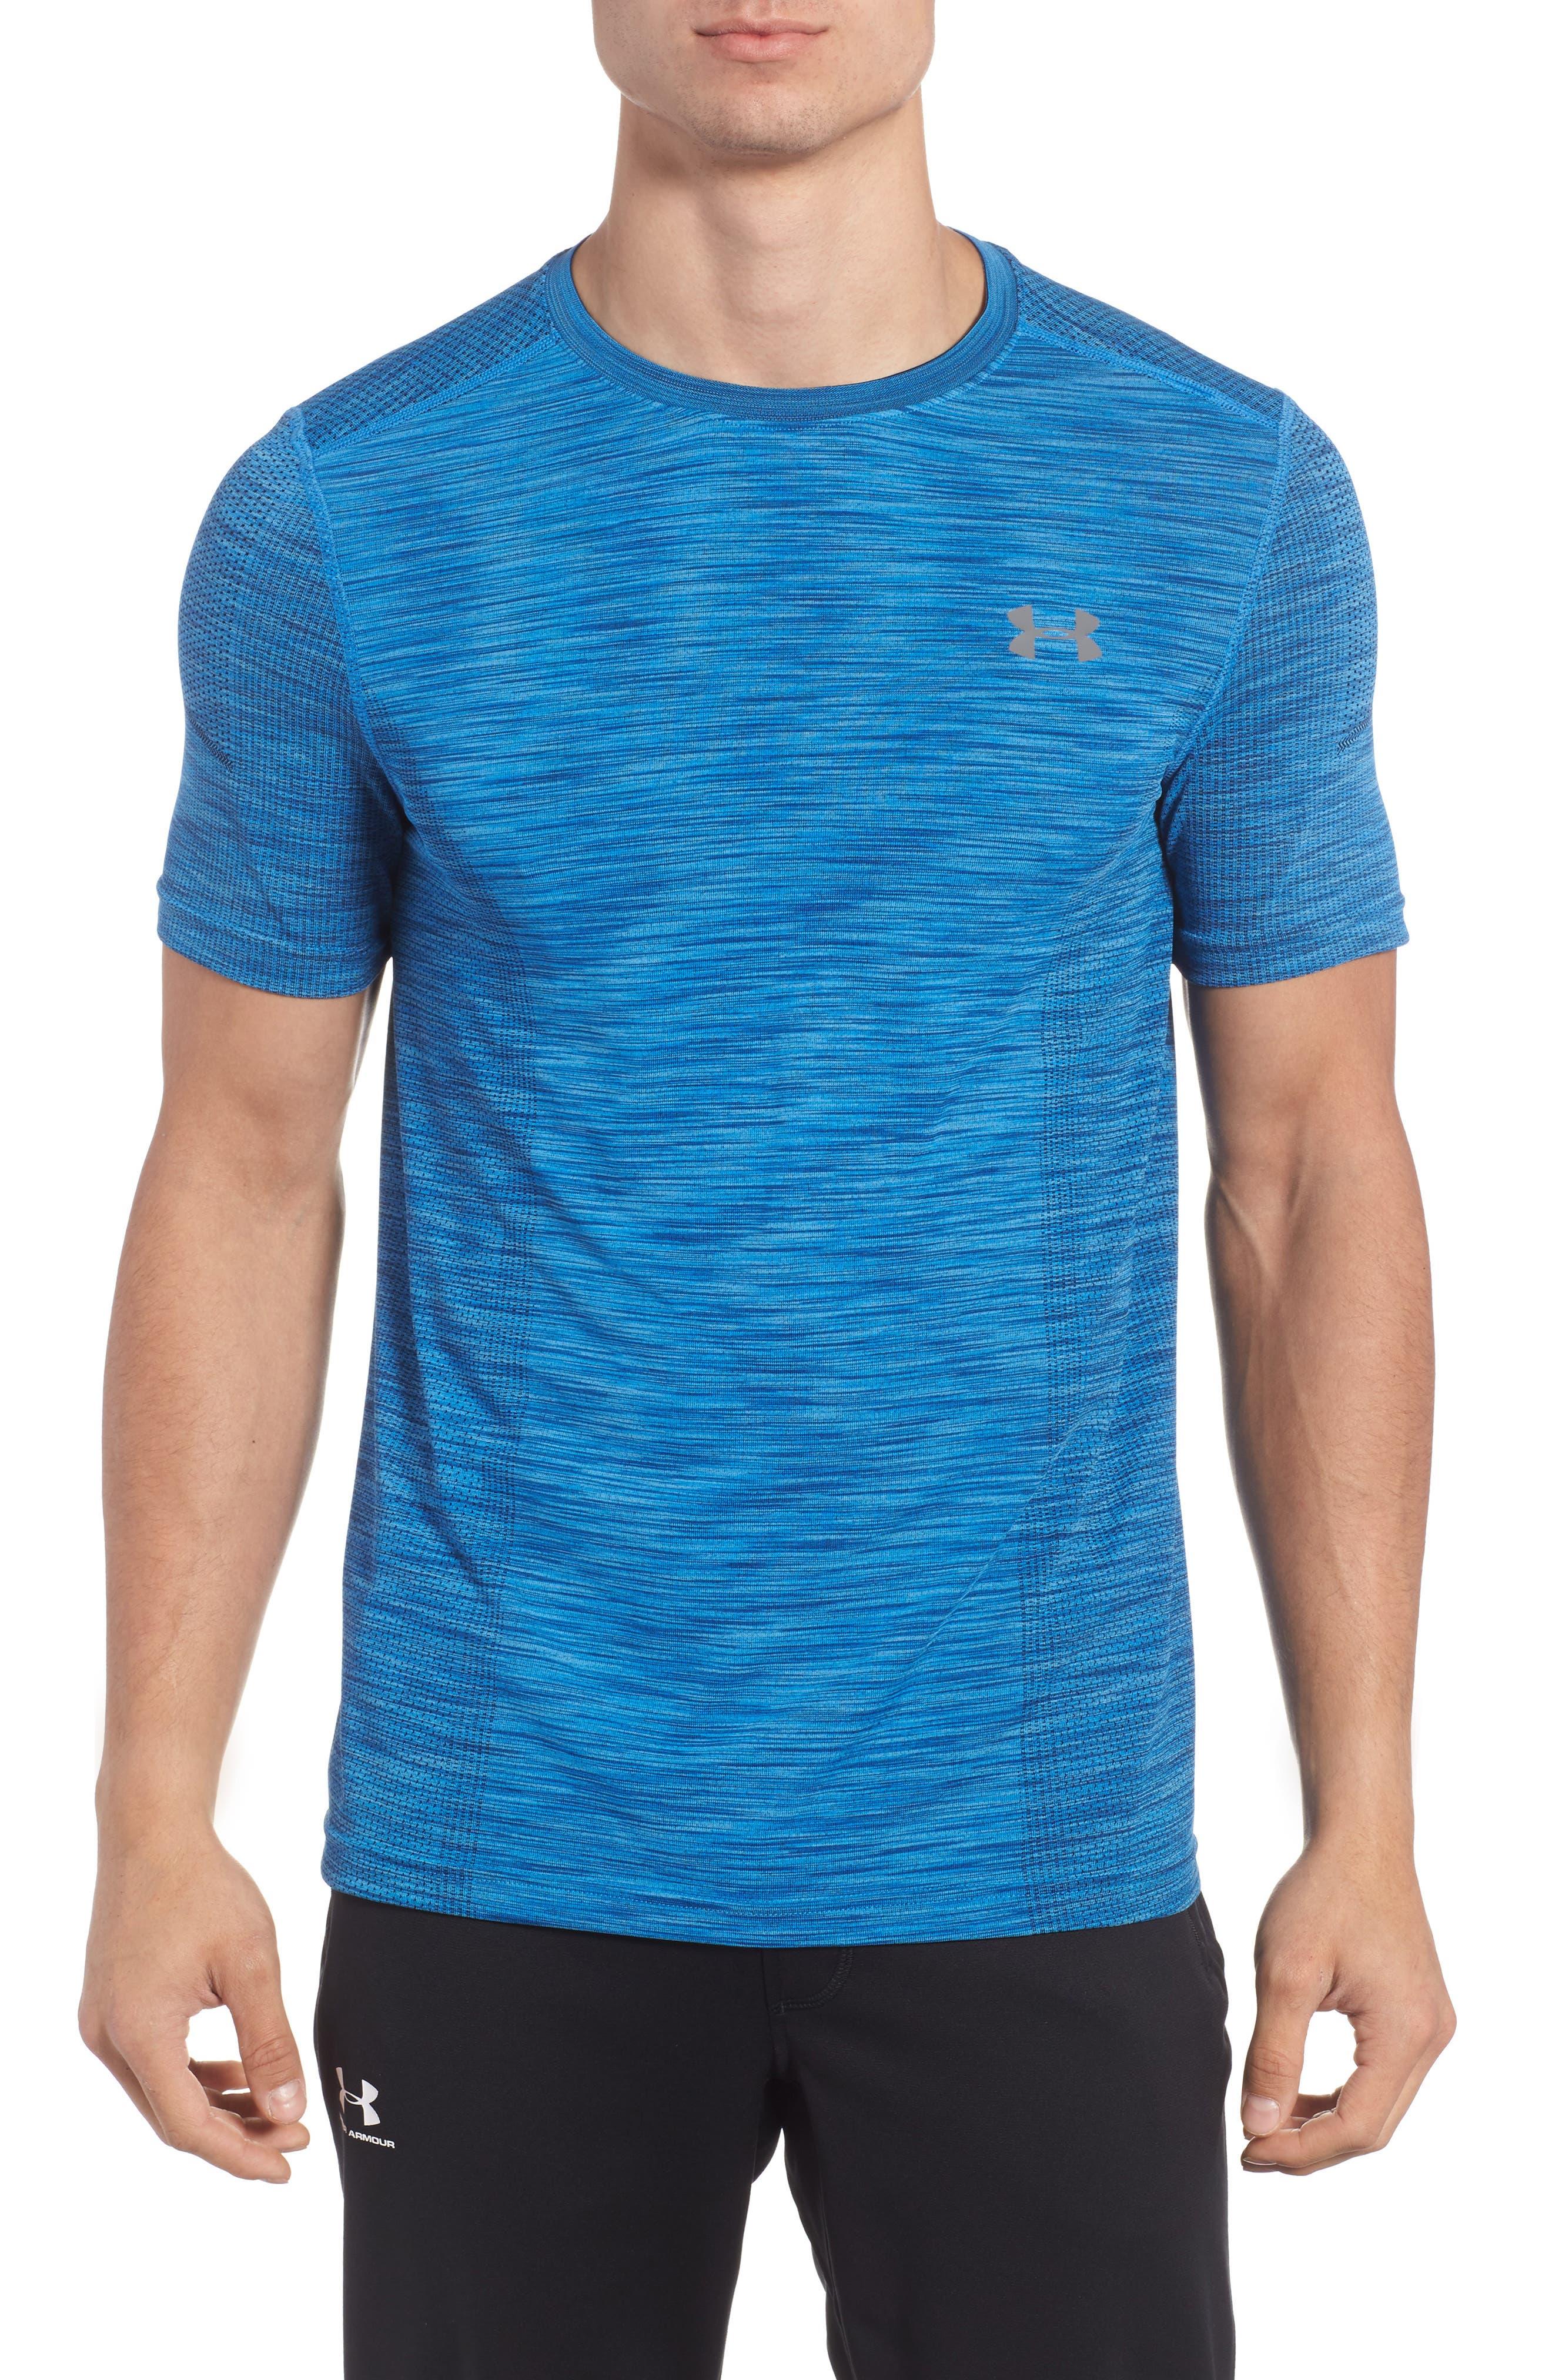 Alternate Image 1 Selected - Under Armour Threadborne Regular Fit T-Shirt